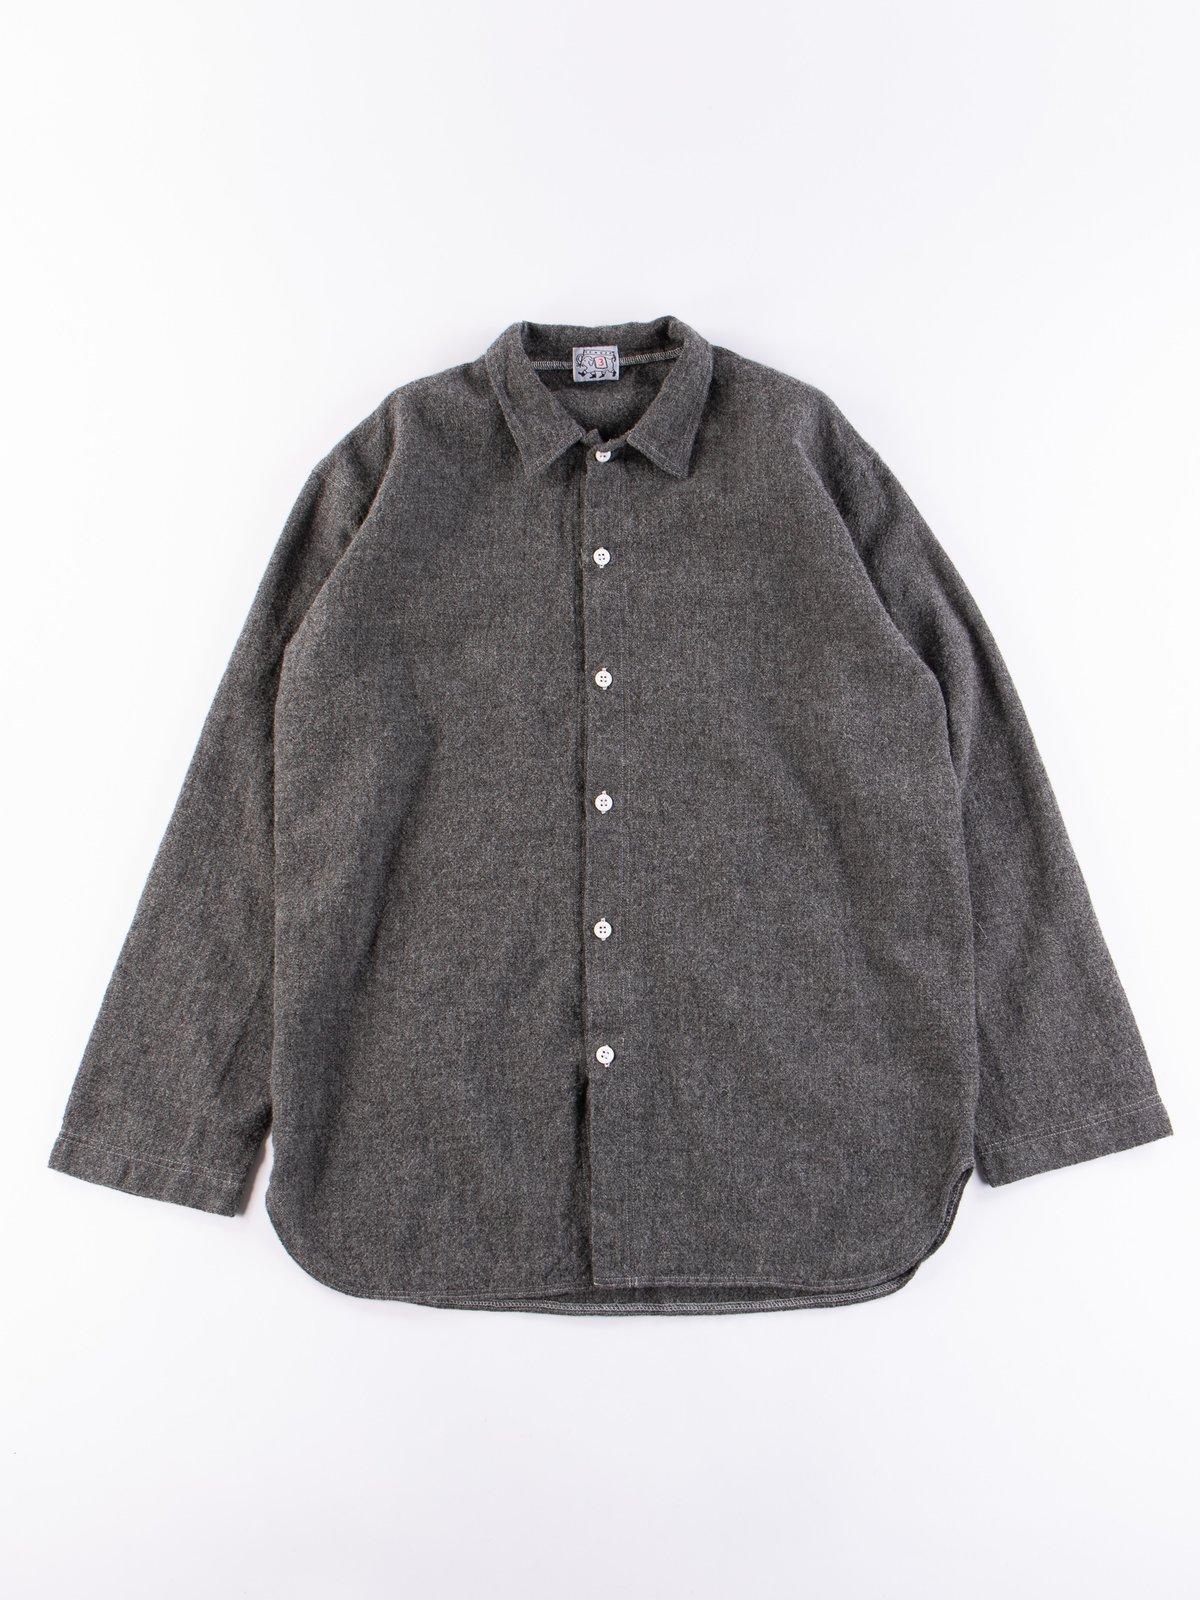 Charcoal Weavers Stock Tail Shirt - Image 1